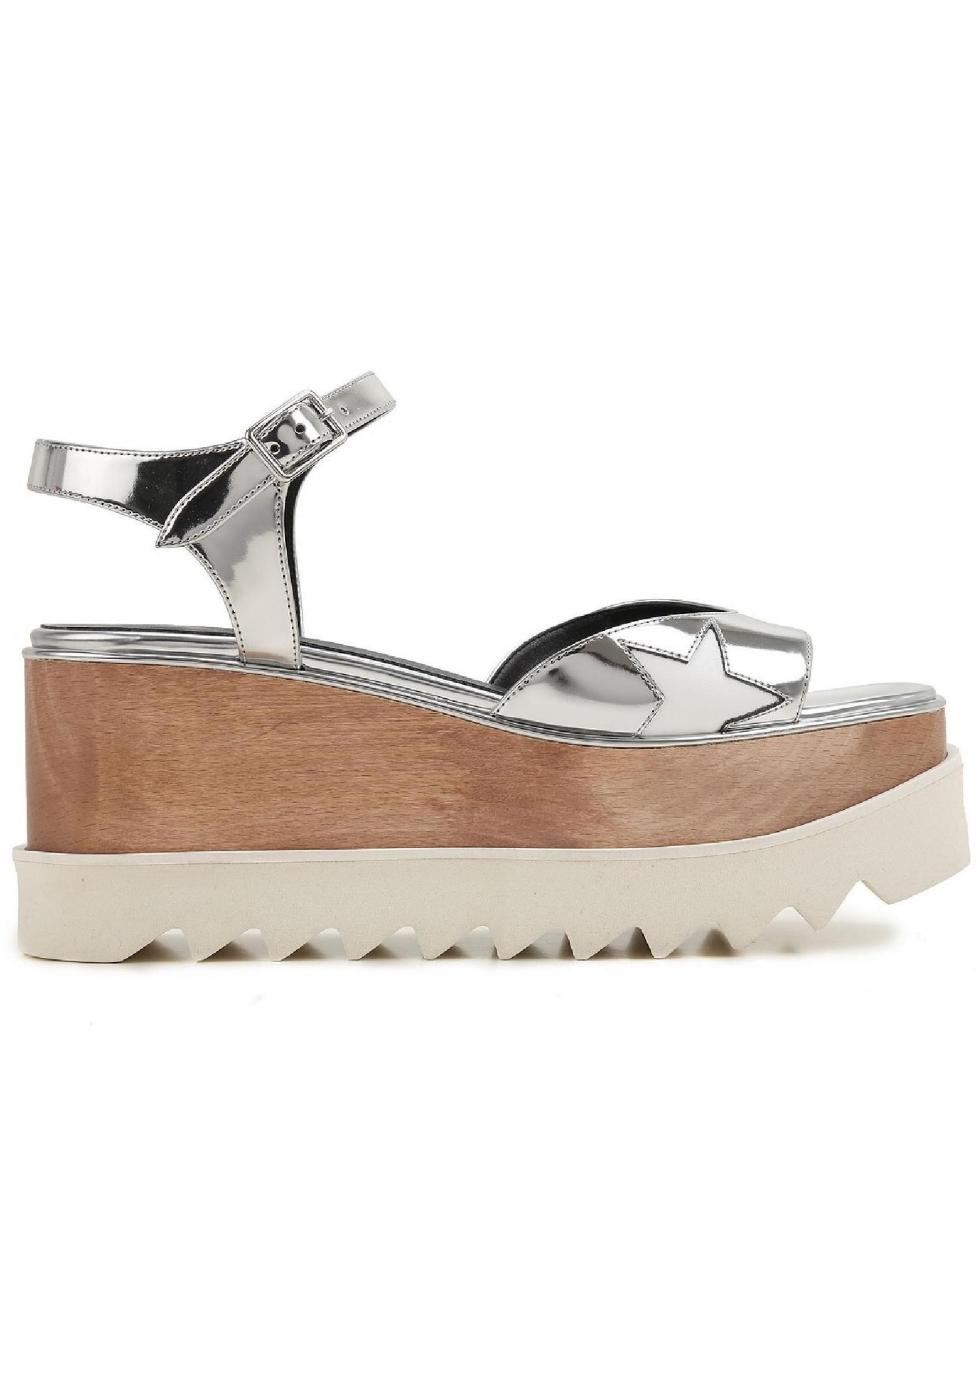 stella mccartney vegan silber wedges sandalen schuhe italian boutique. Black Bedroom Furniture Sets. Home Design Ideas